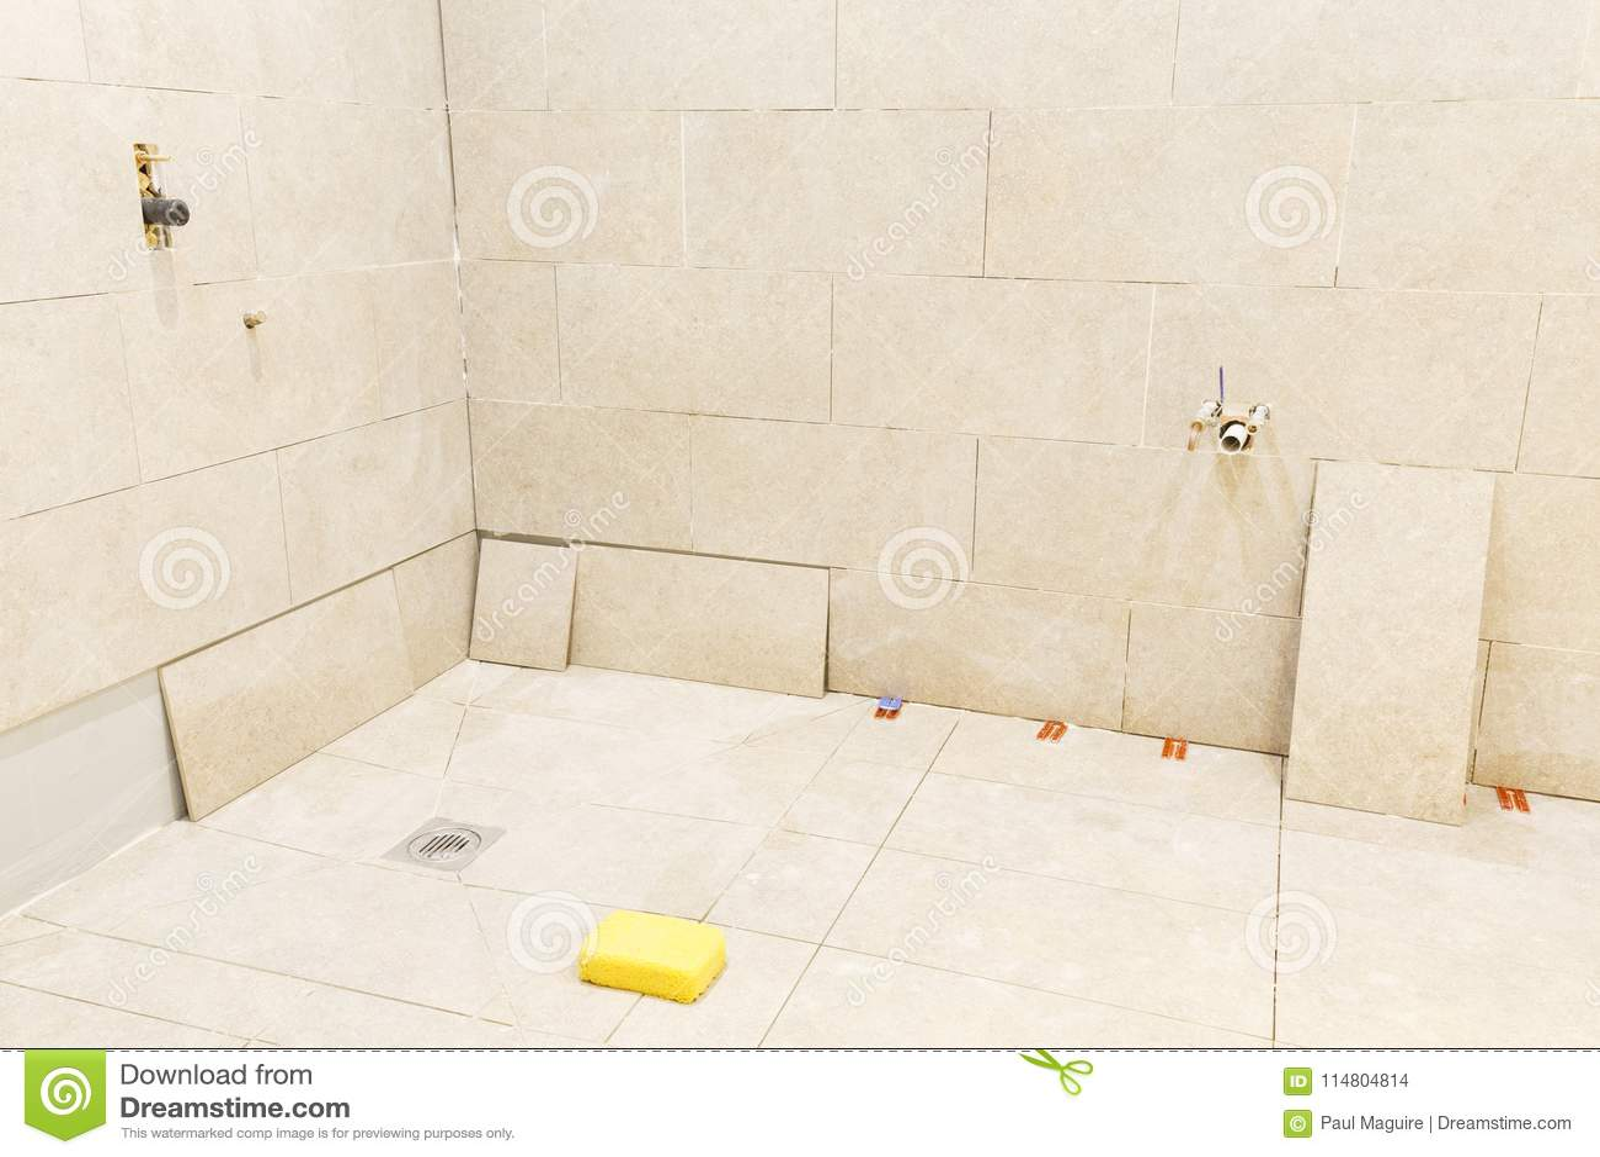 Tiling Work In A Bathroom Wet Room Stock Photo - Image of floors ...